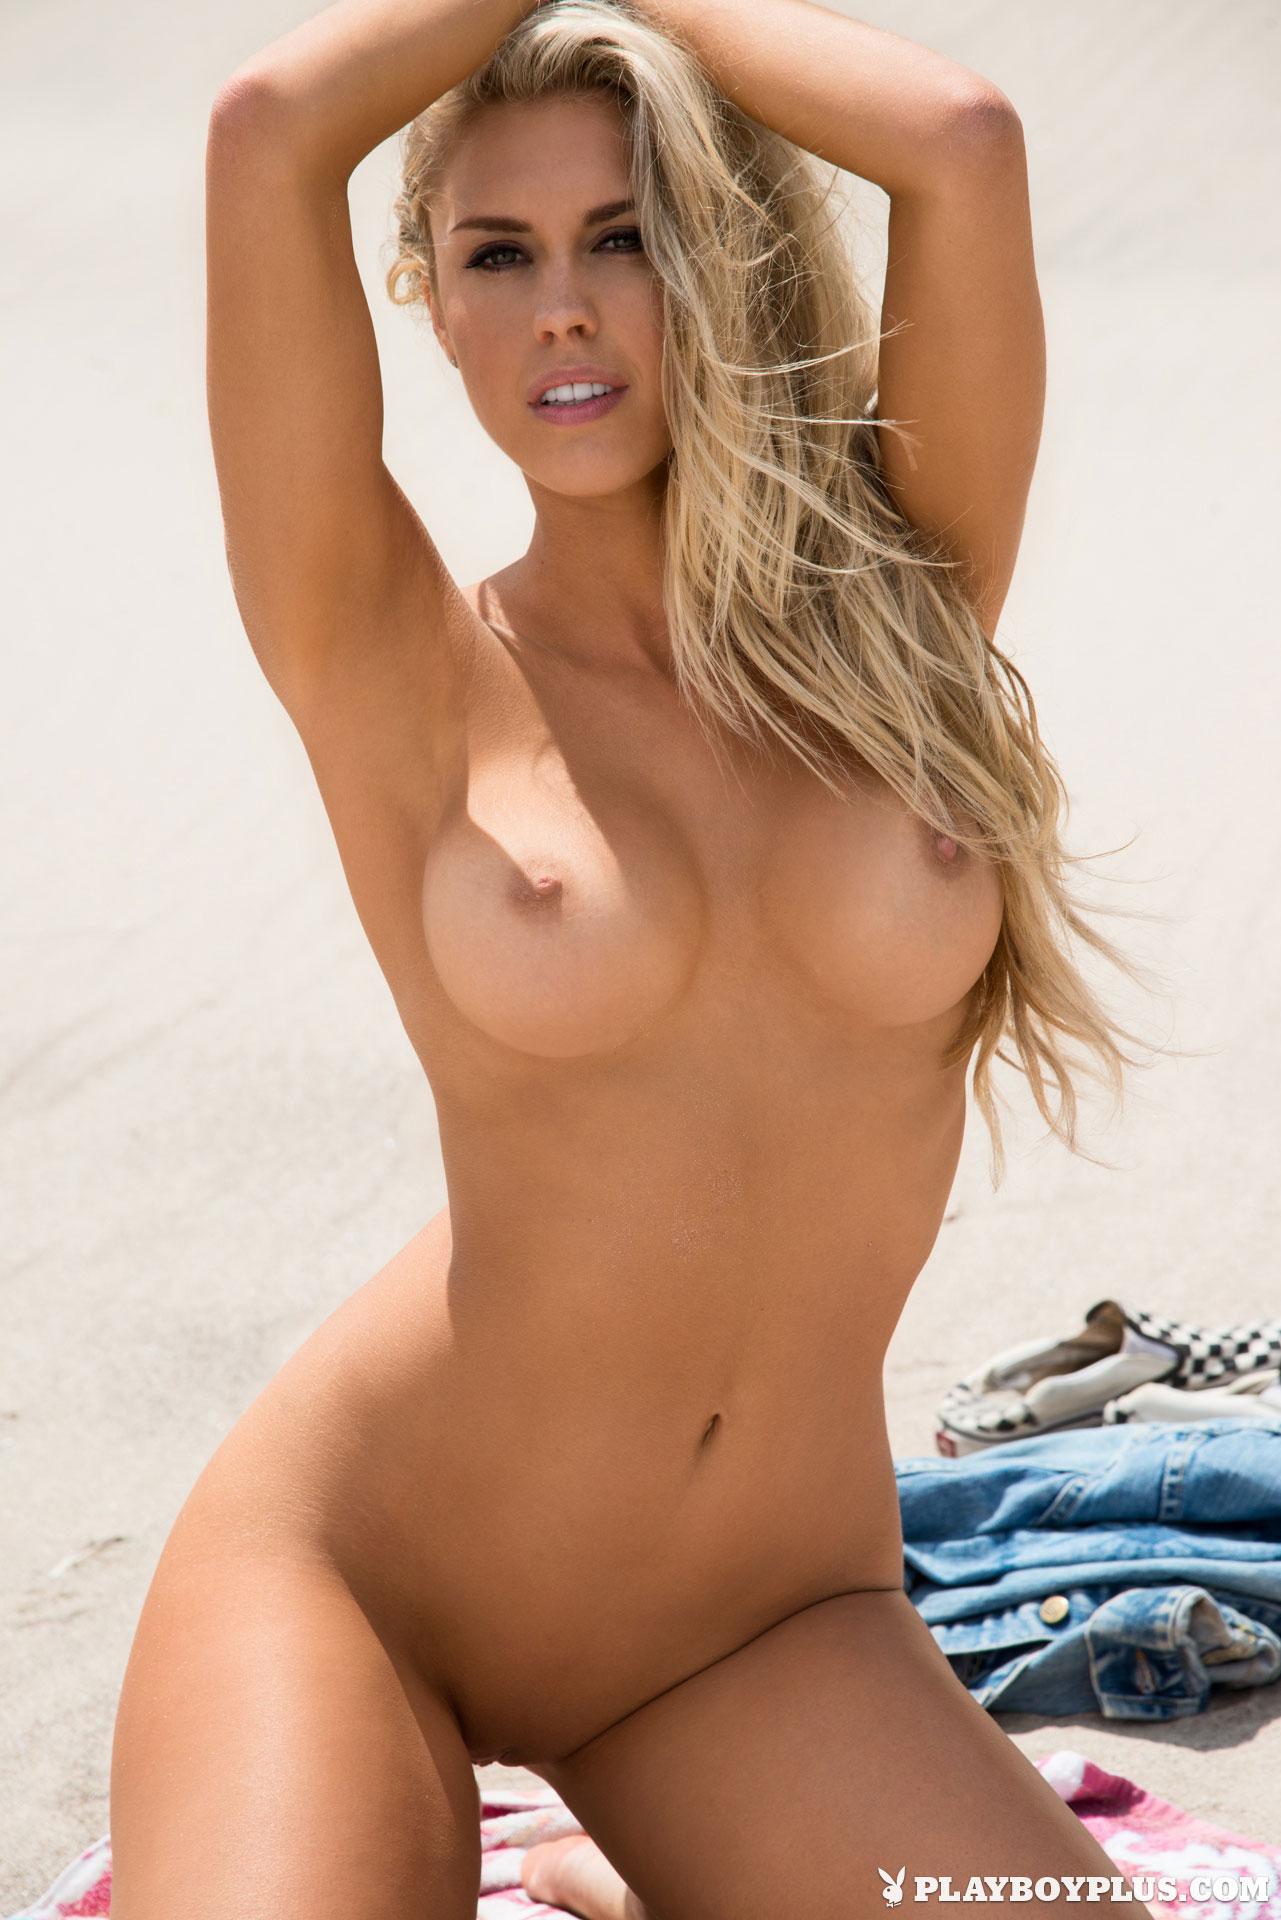 Kayla rae reid porn